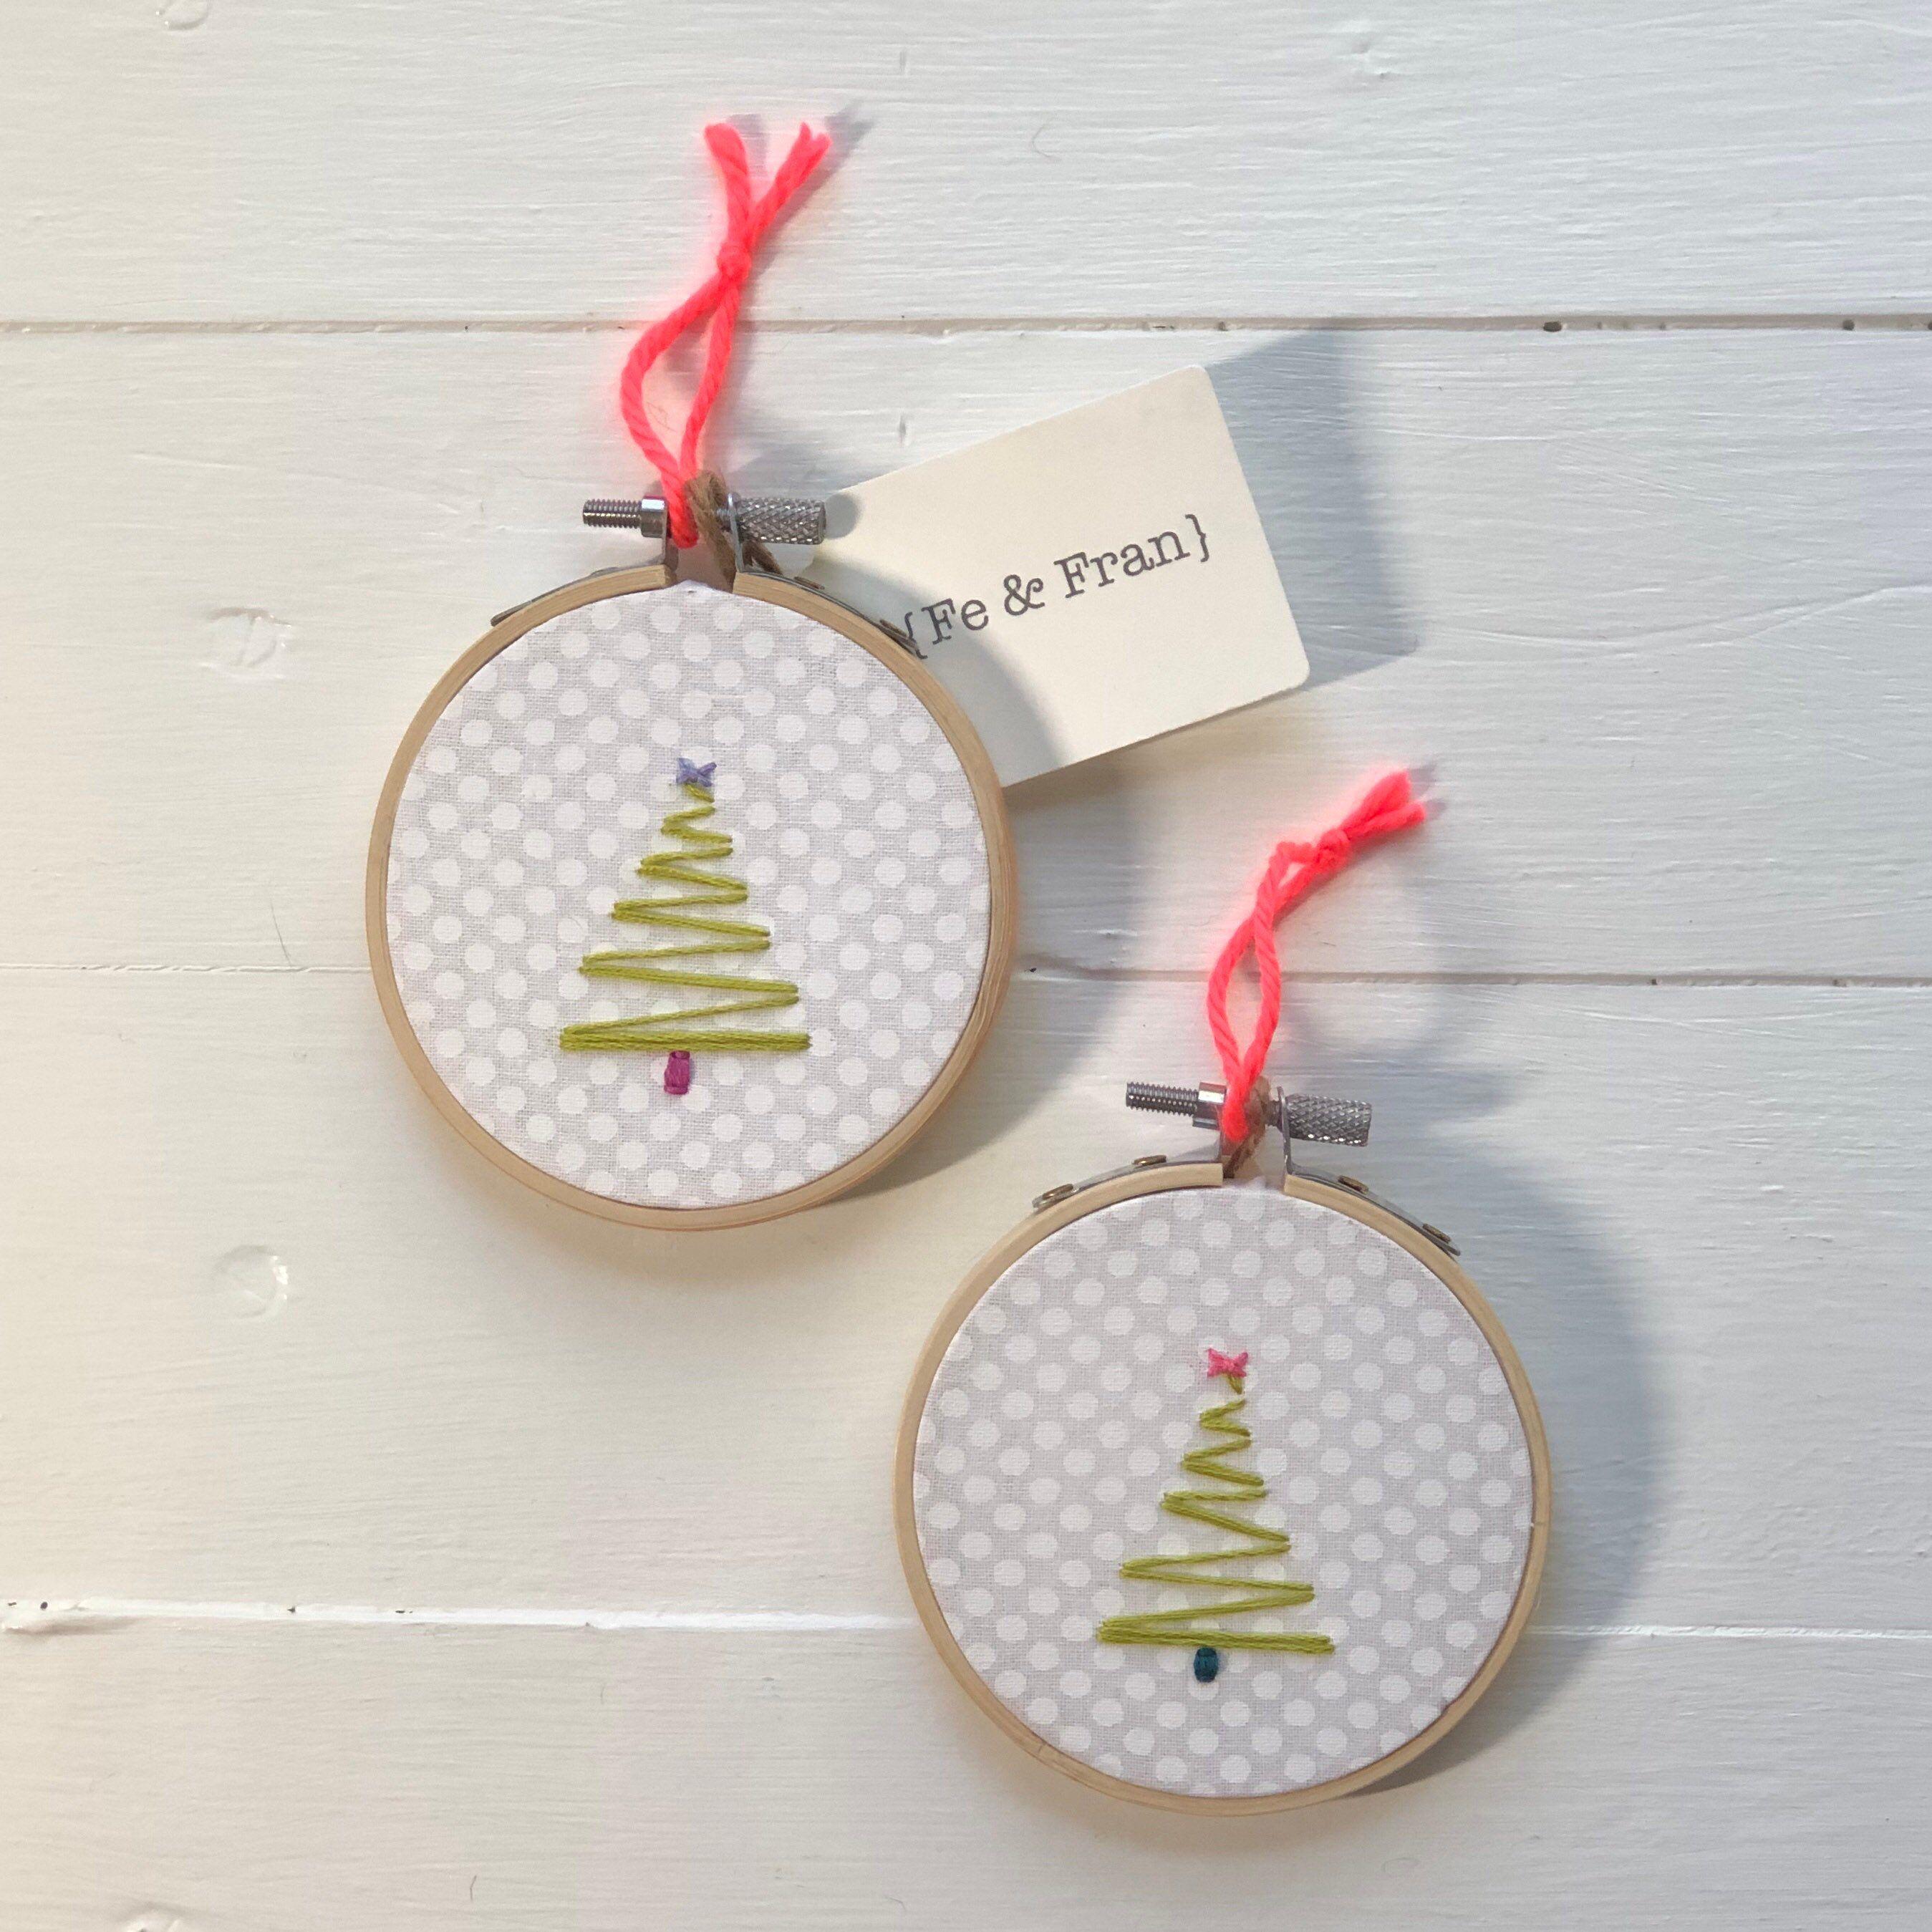 Christmas Tree Ornament Christmas Tree Embroidery Hoop Etsy In 2020 Christmas Tree Ornaments Embroidery Hoop Christmas Ornaments